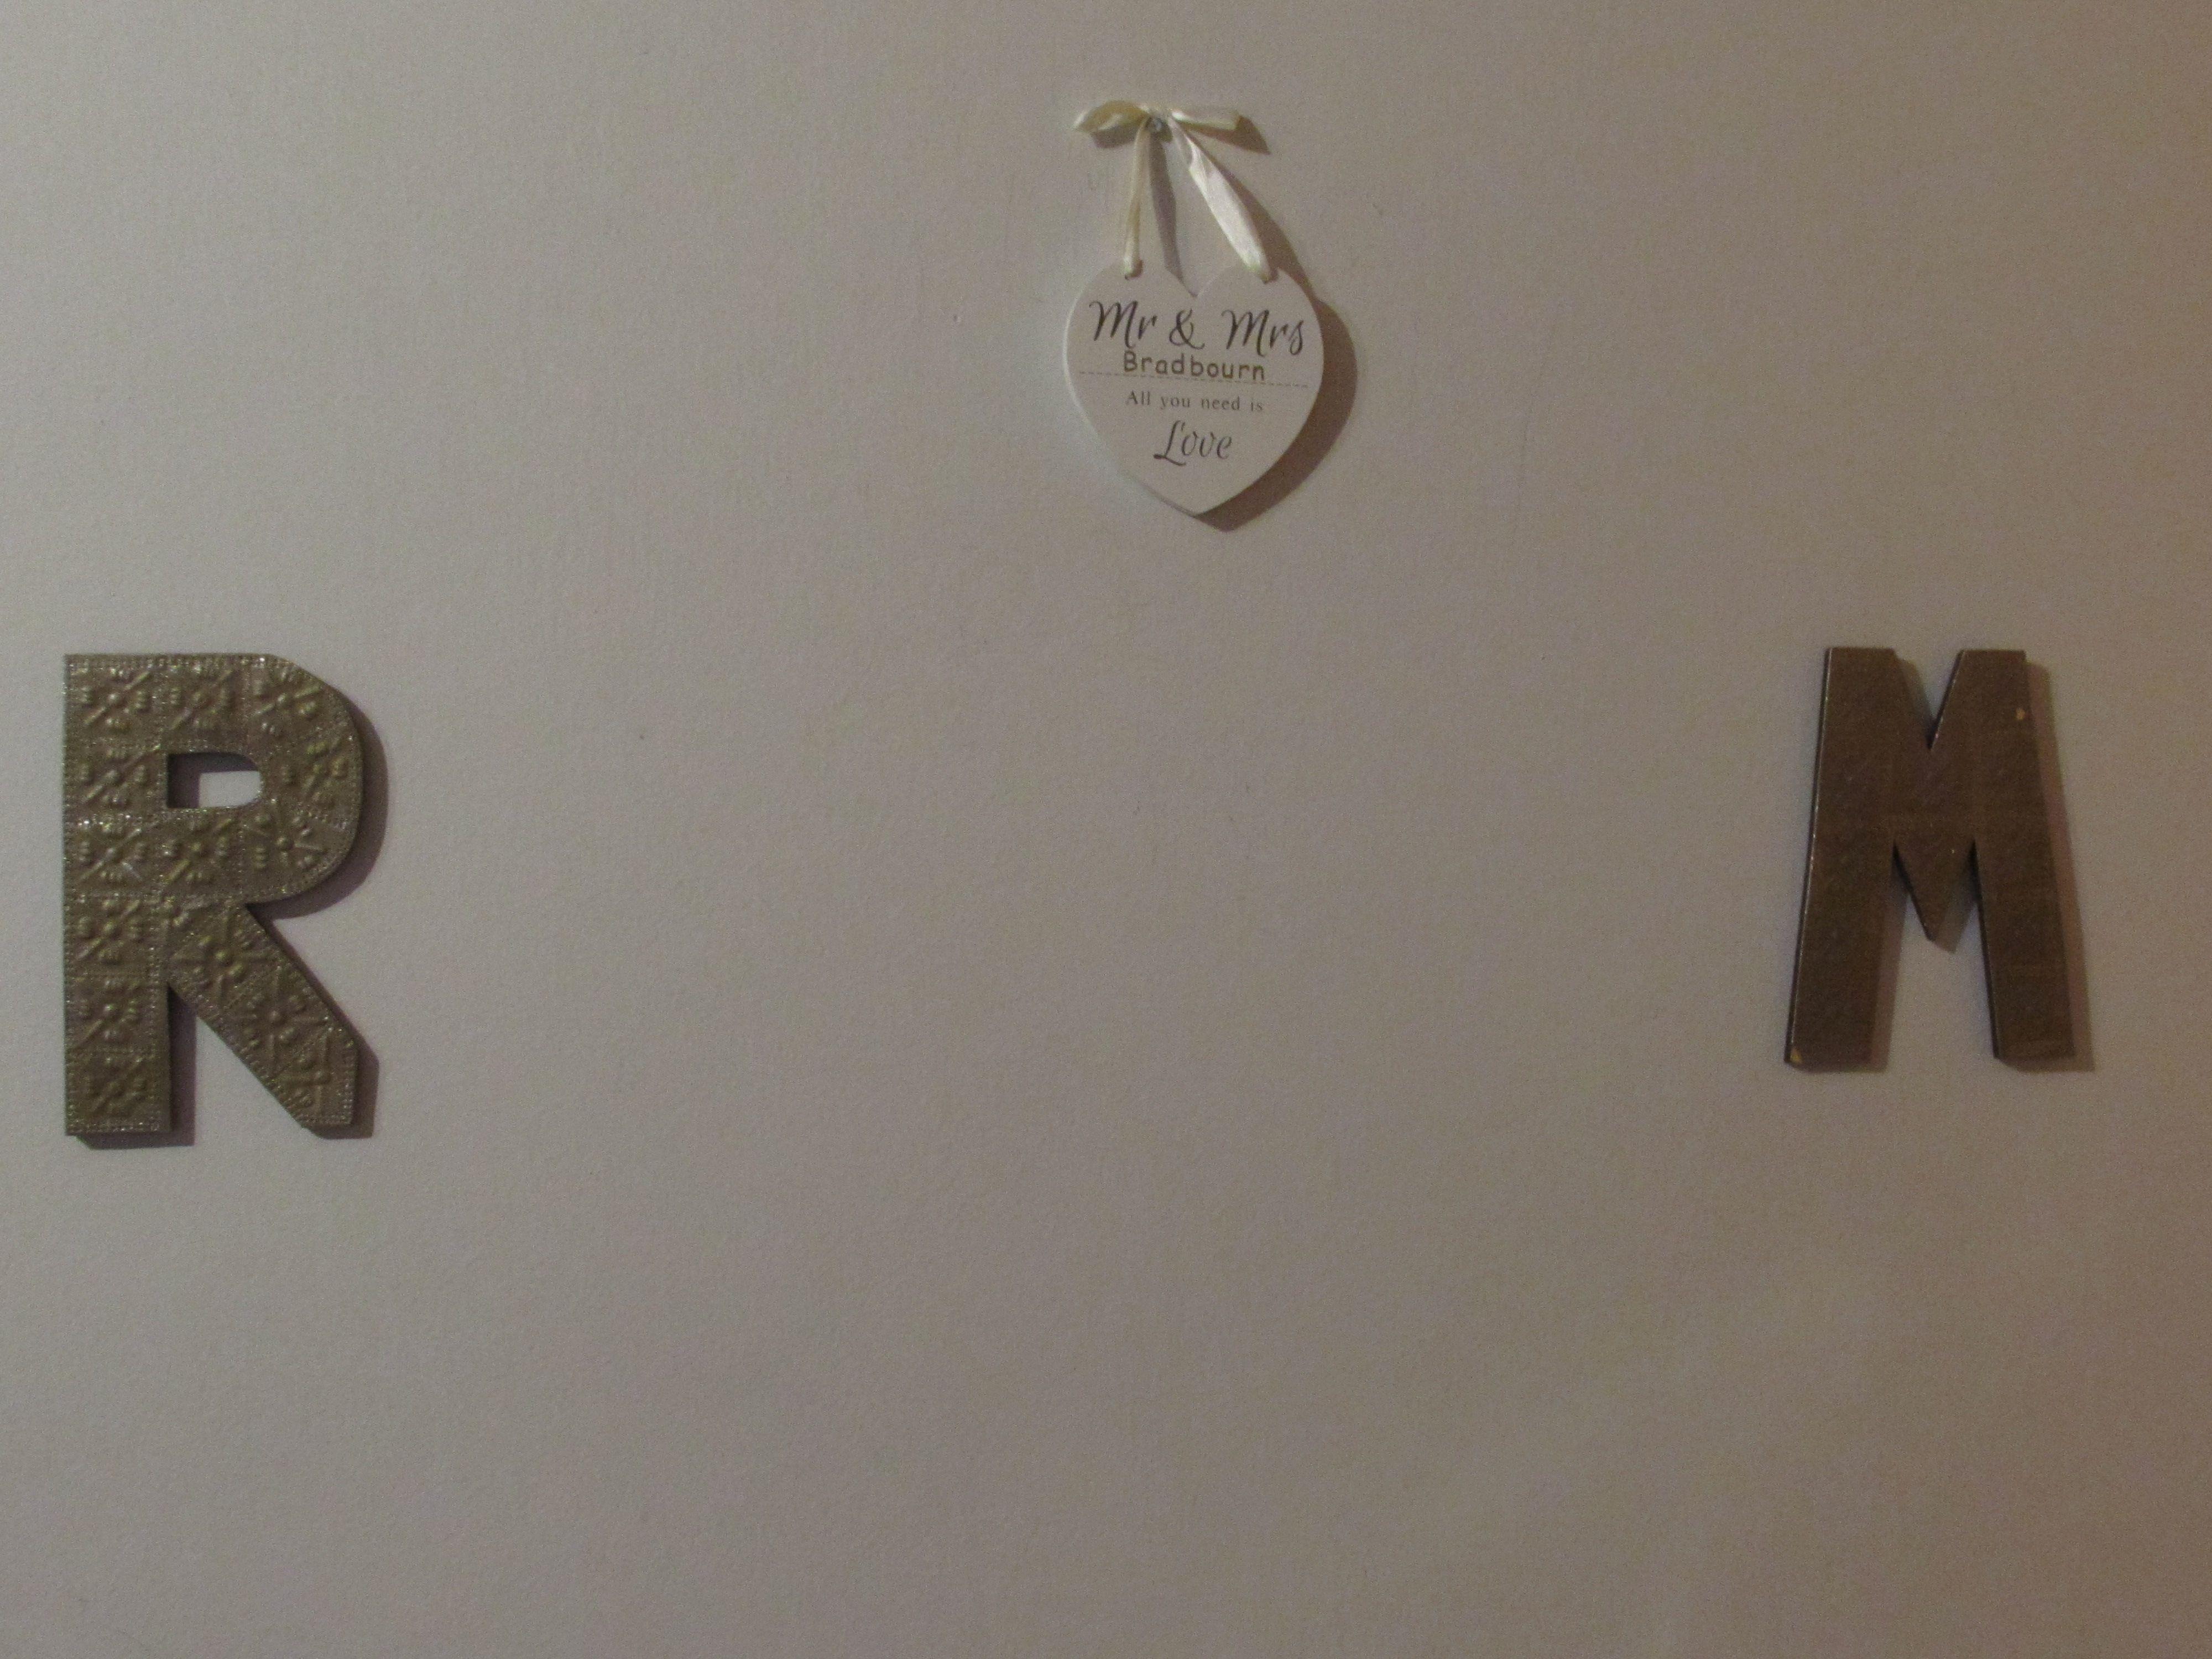 Bride & Groom initial decorations